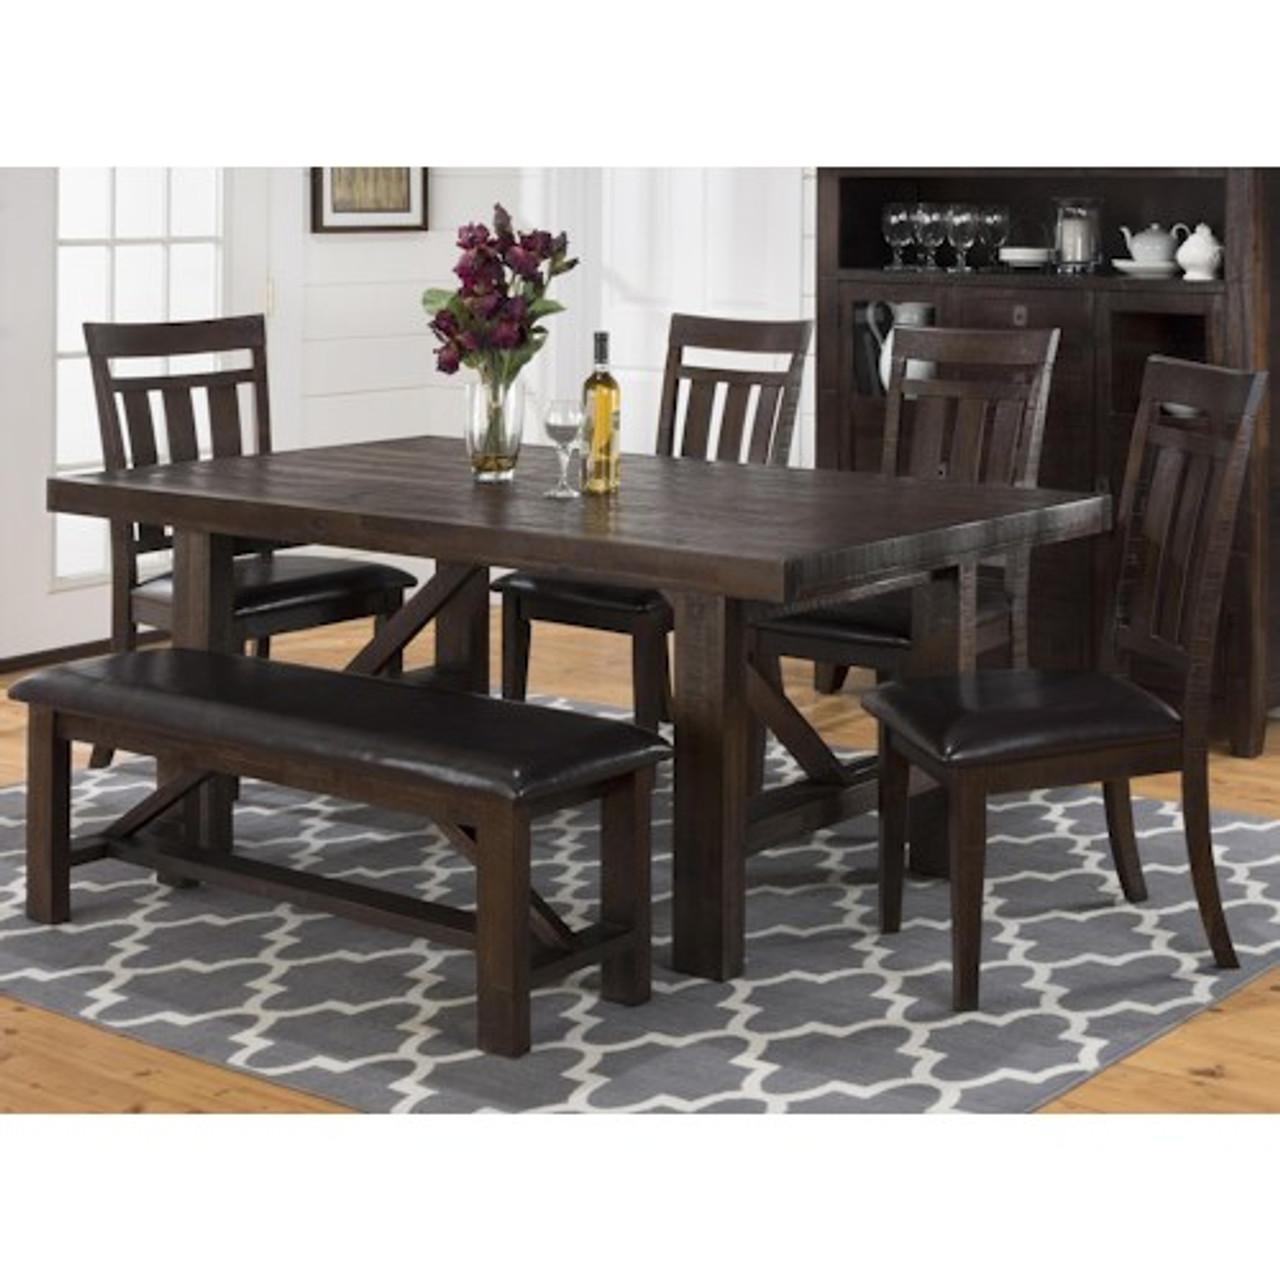 Miraculous Kona Grove 6 Piece Dining Set Includes Table Bench And 4 Chairs Creativecarmelina Interior Chair Design Creativecarmelinacom